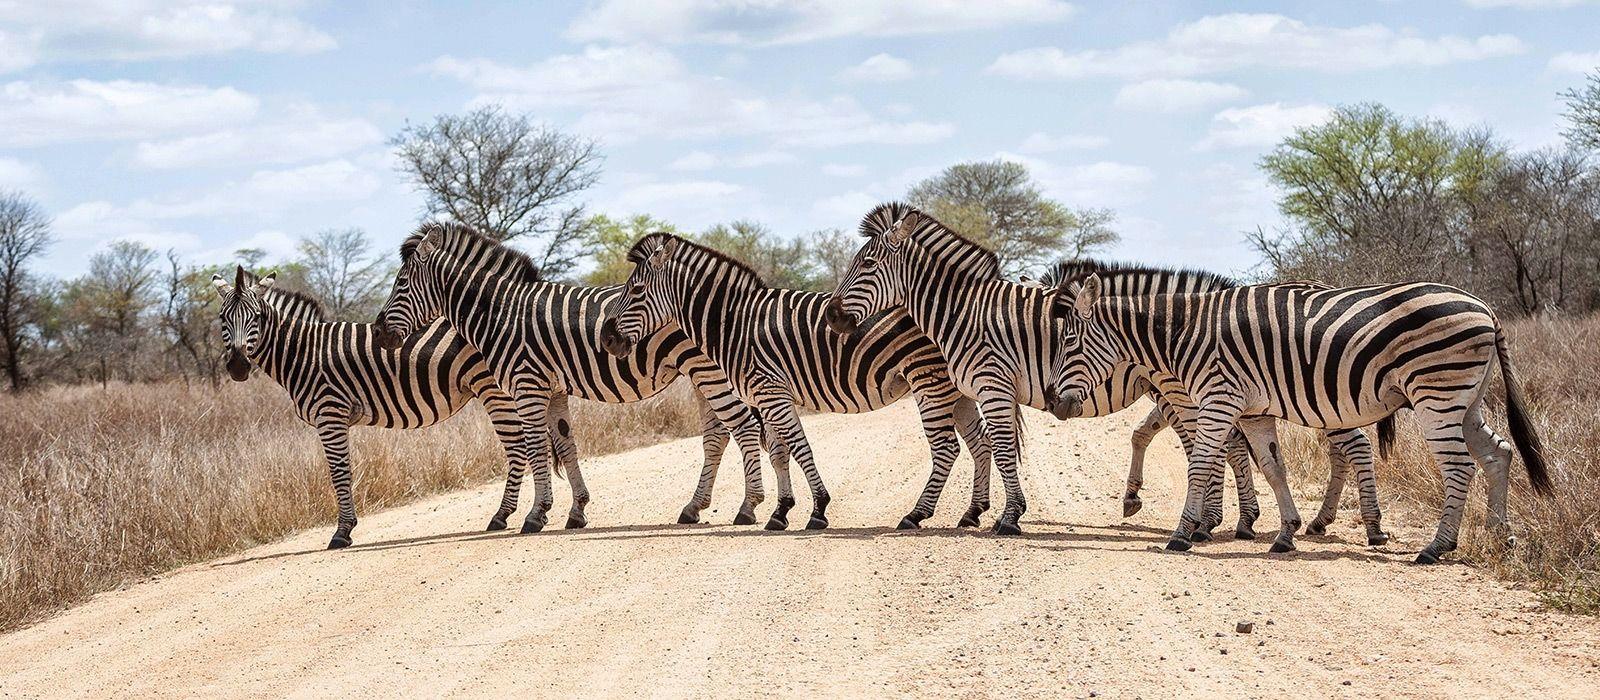 Reiseziel Krüger Südafrika